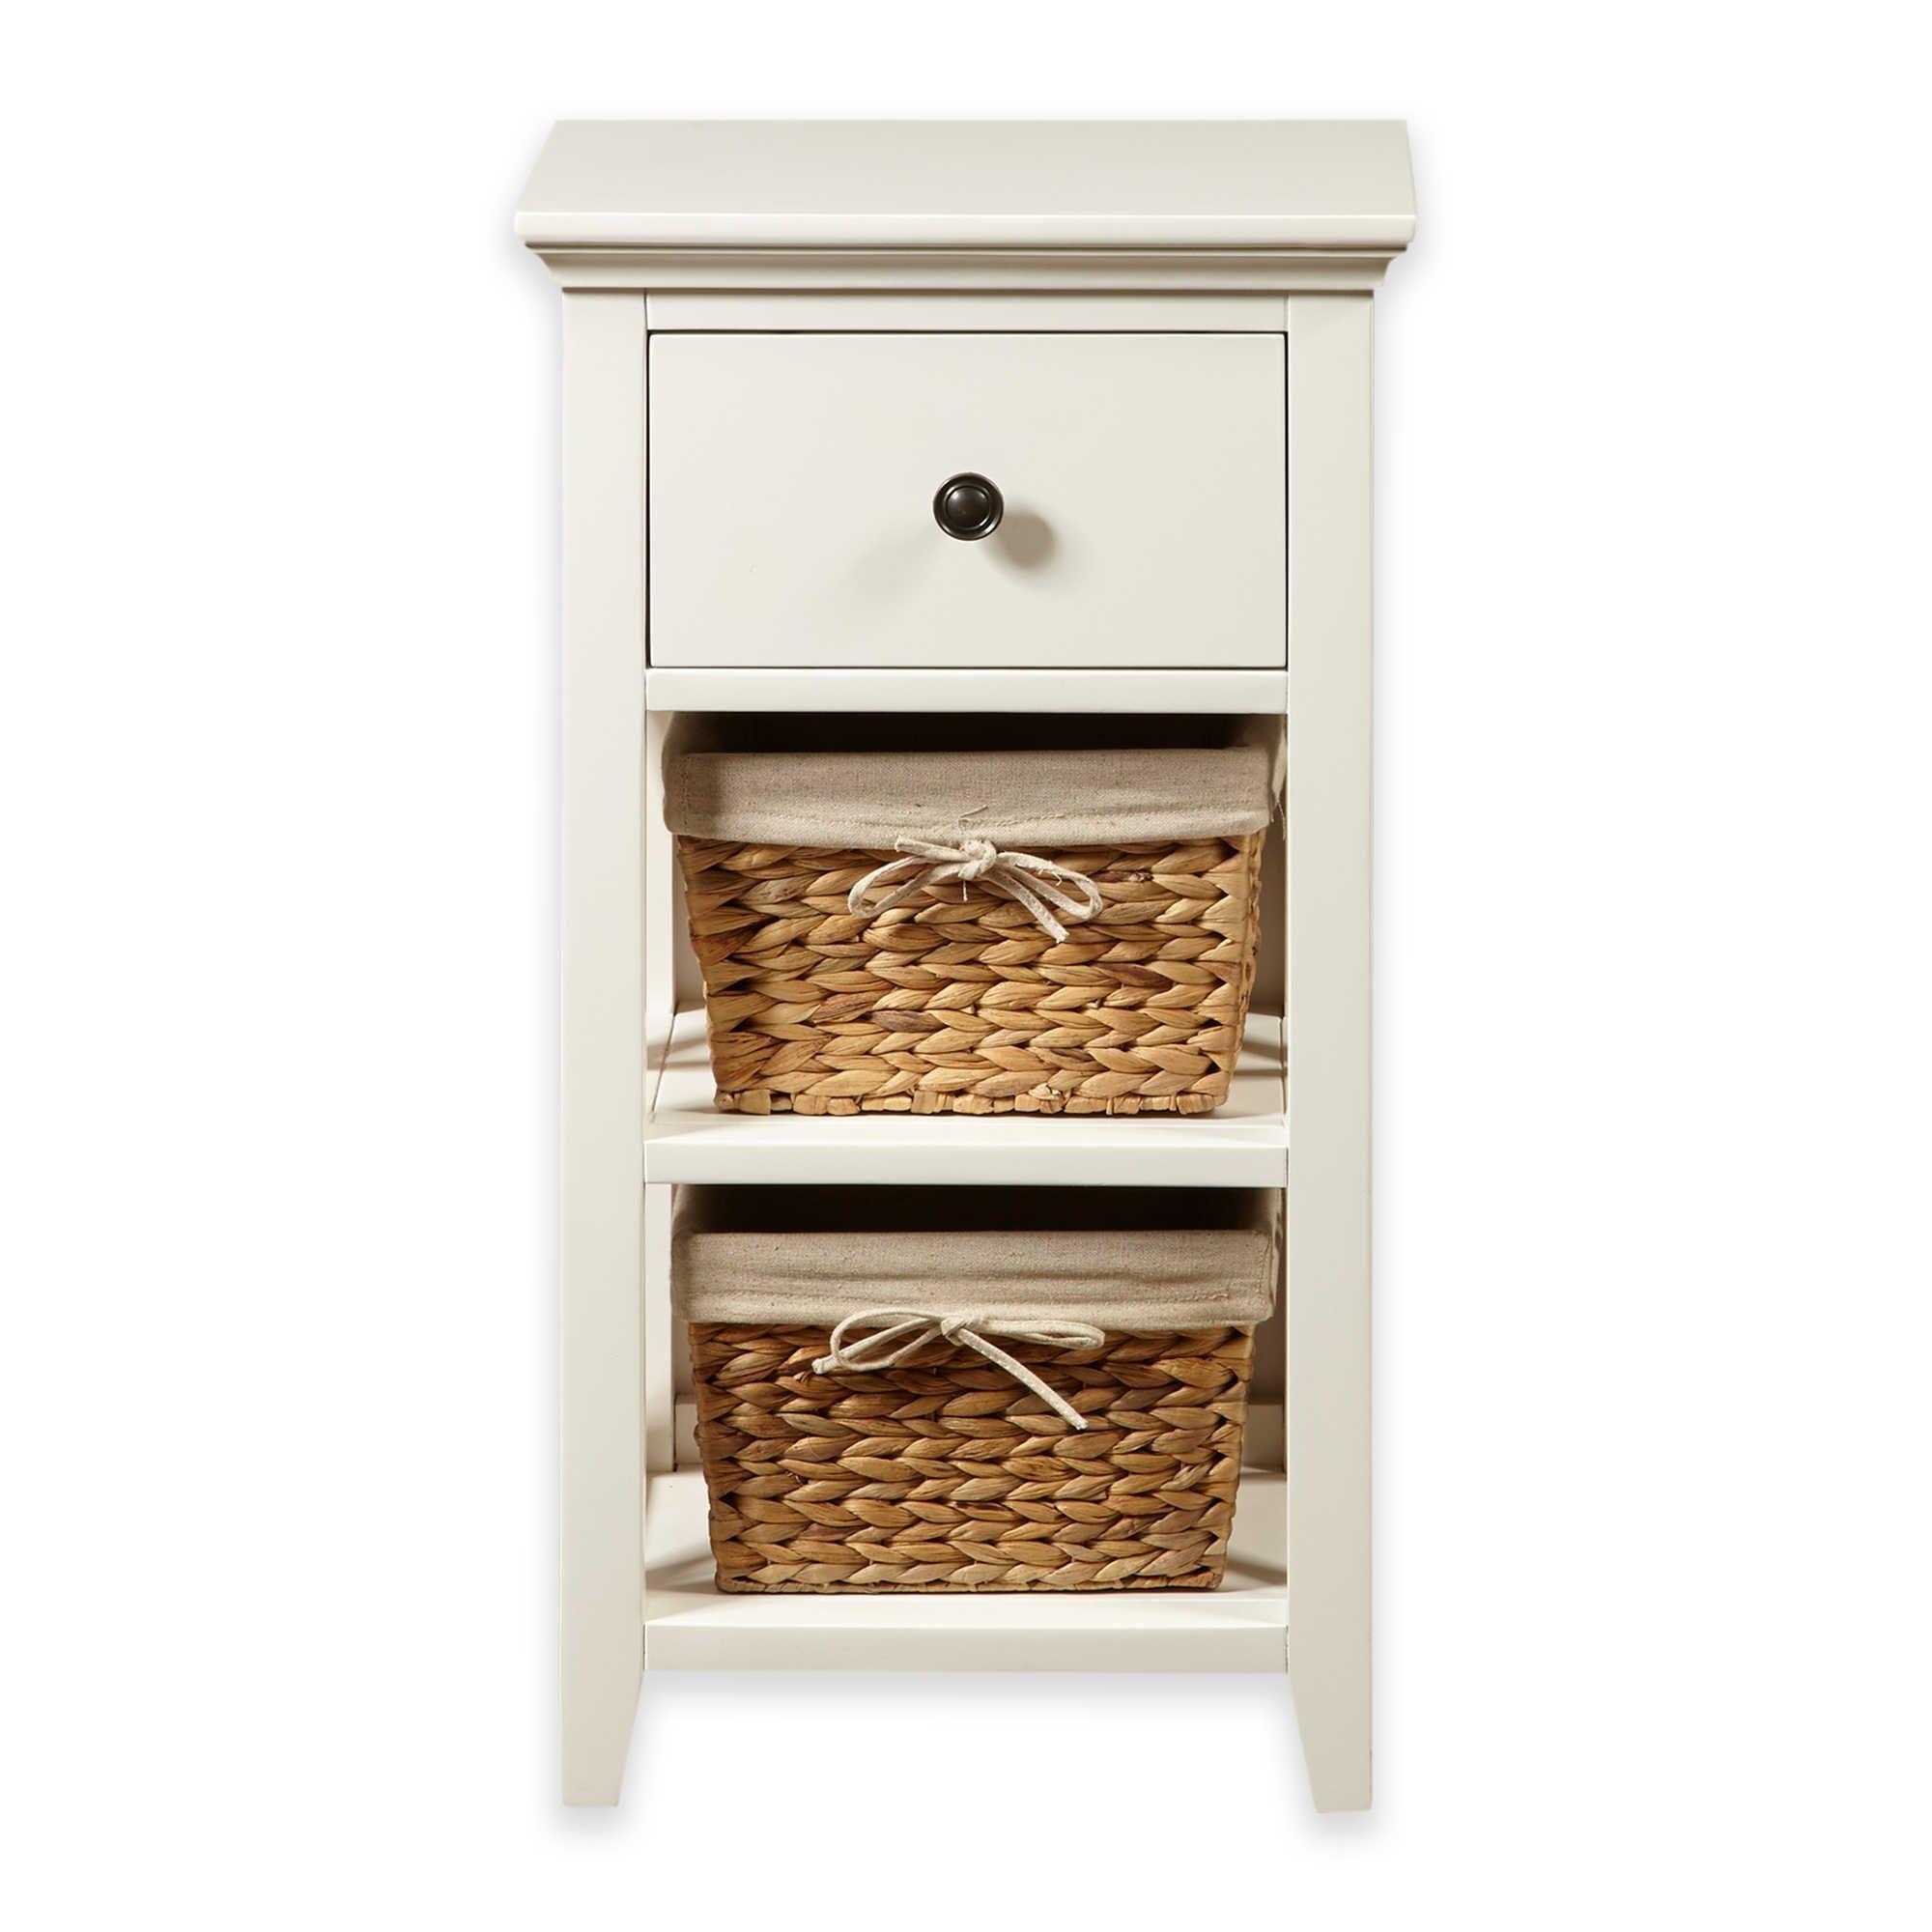 Pulaski Basket Bathroom Storage Cabinet In Linen White intended for proportions 2000 X 2000